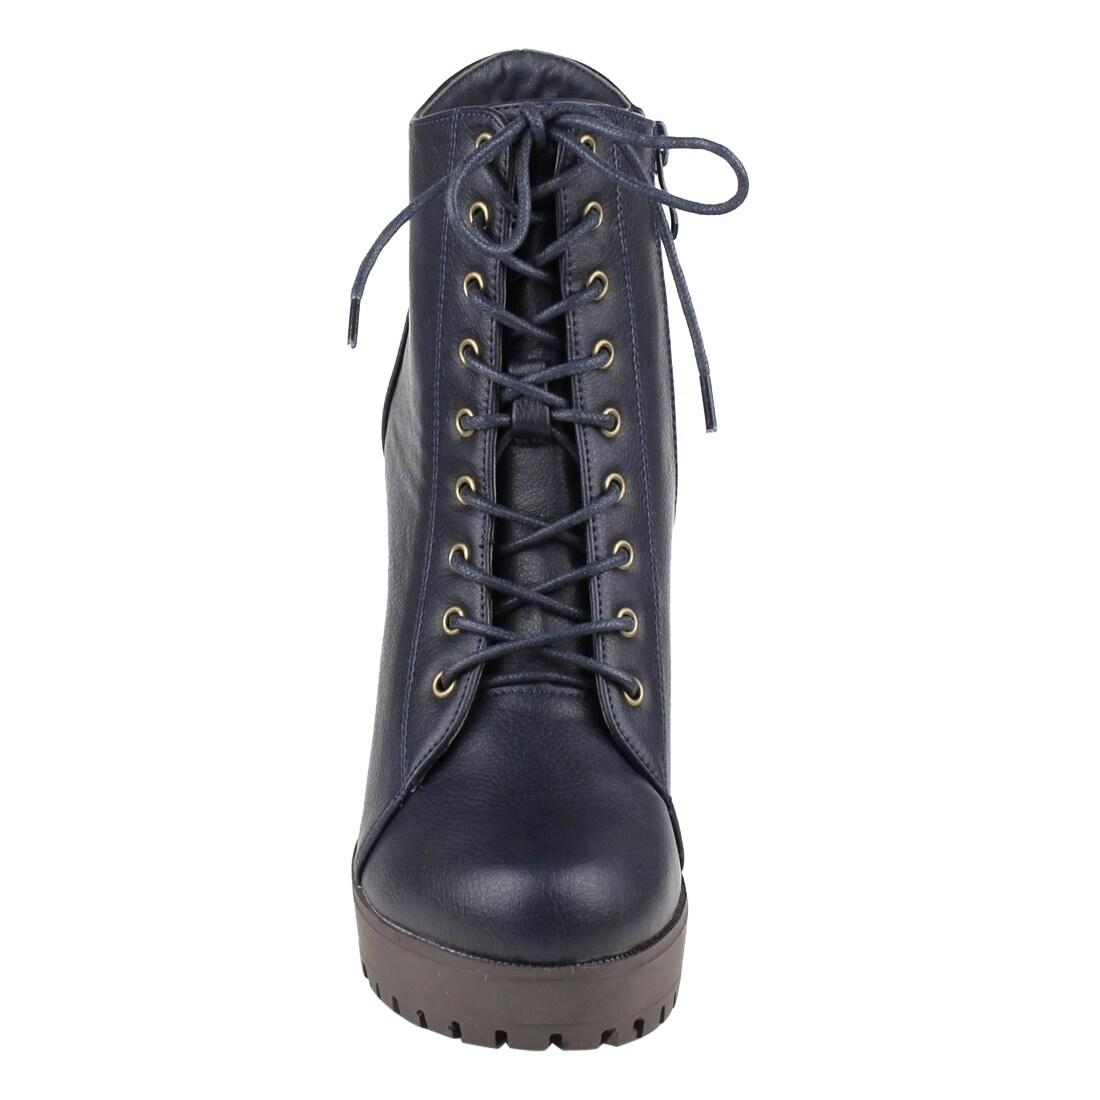 d38f0f822de1 Shop Beston FM39 Women s Platform Lug Sole Stacked Chunky Heel Combat  Booties - Free Shipping On Orders Over  45 - Overstock - 17894279